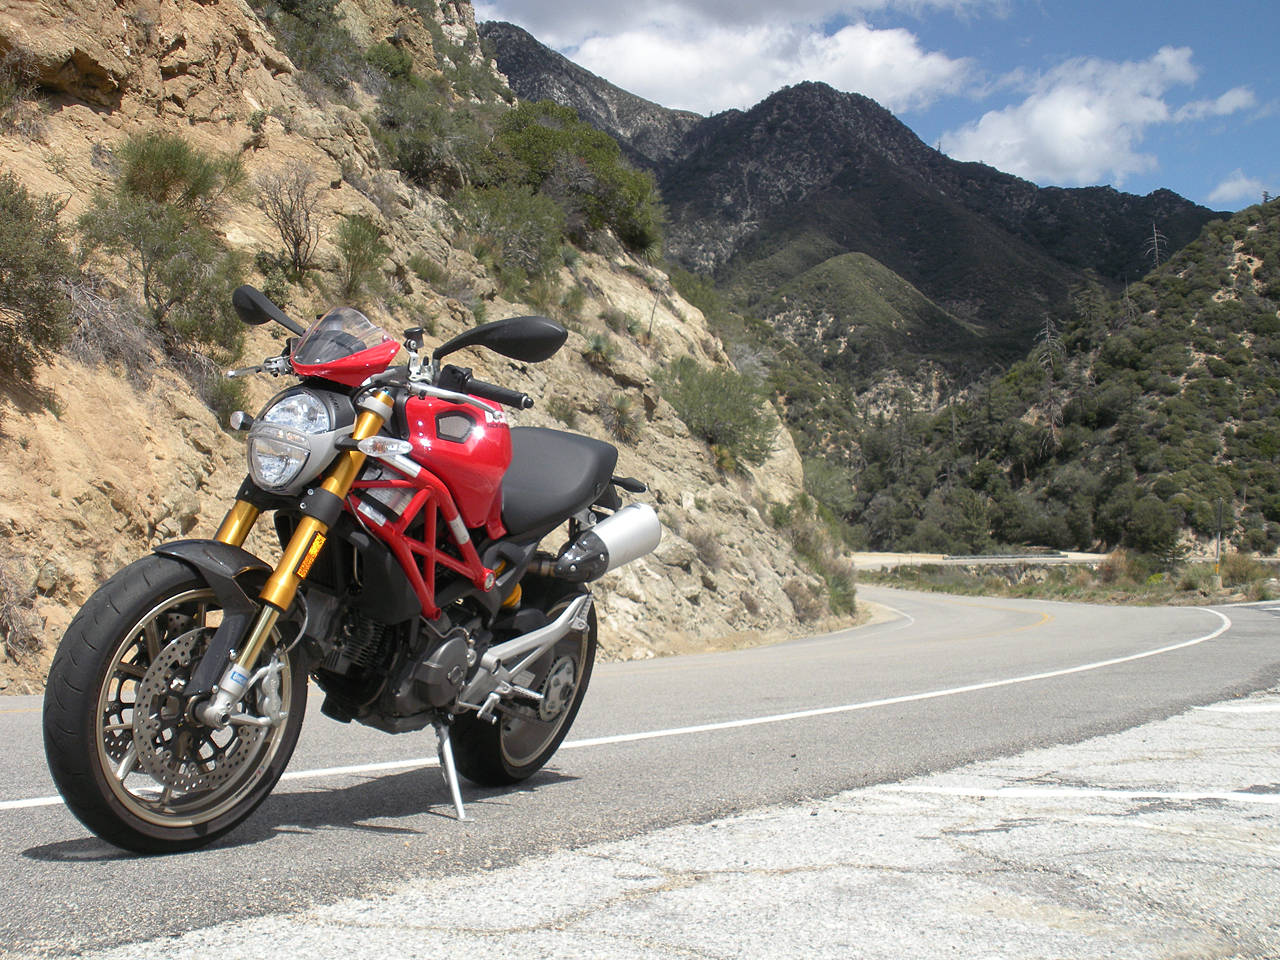 http://3.bp.blogspot.com/_5_ewoocjMX0/TPueXA2J_jI/AAAAAAAAA0I/YcEZHJDX7M0/s1600/09_Ducati_Monster_1100S_road_scenic.jpg